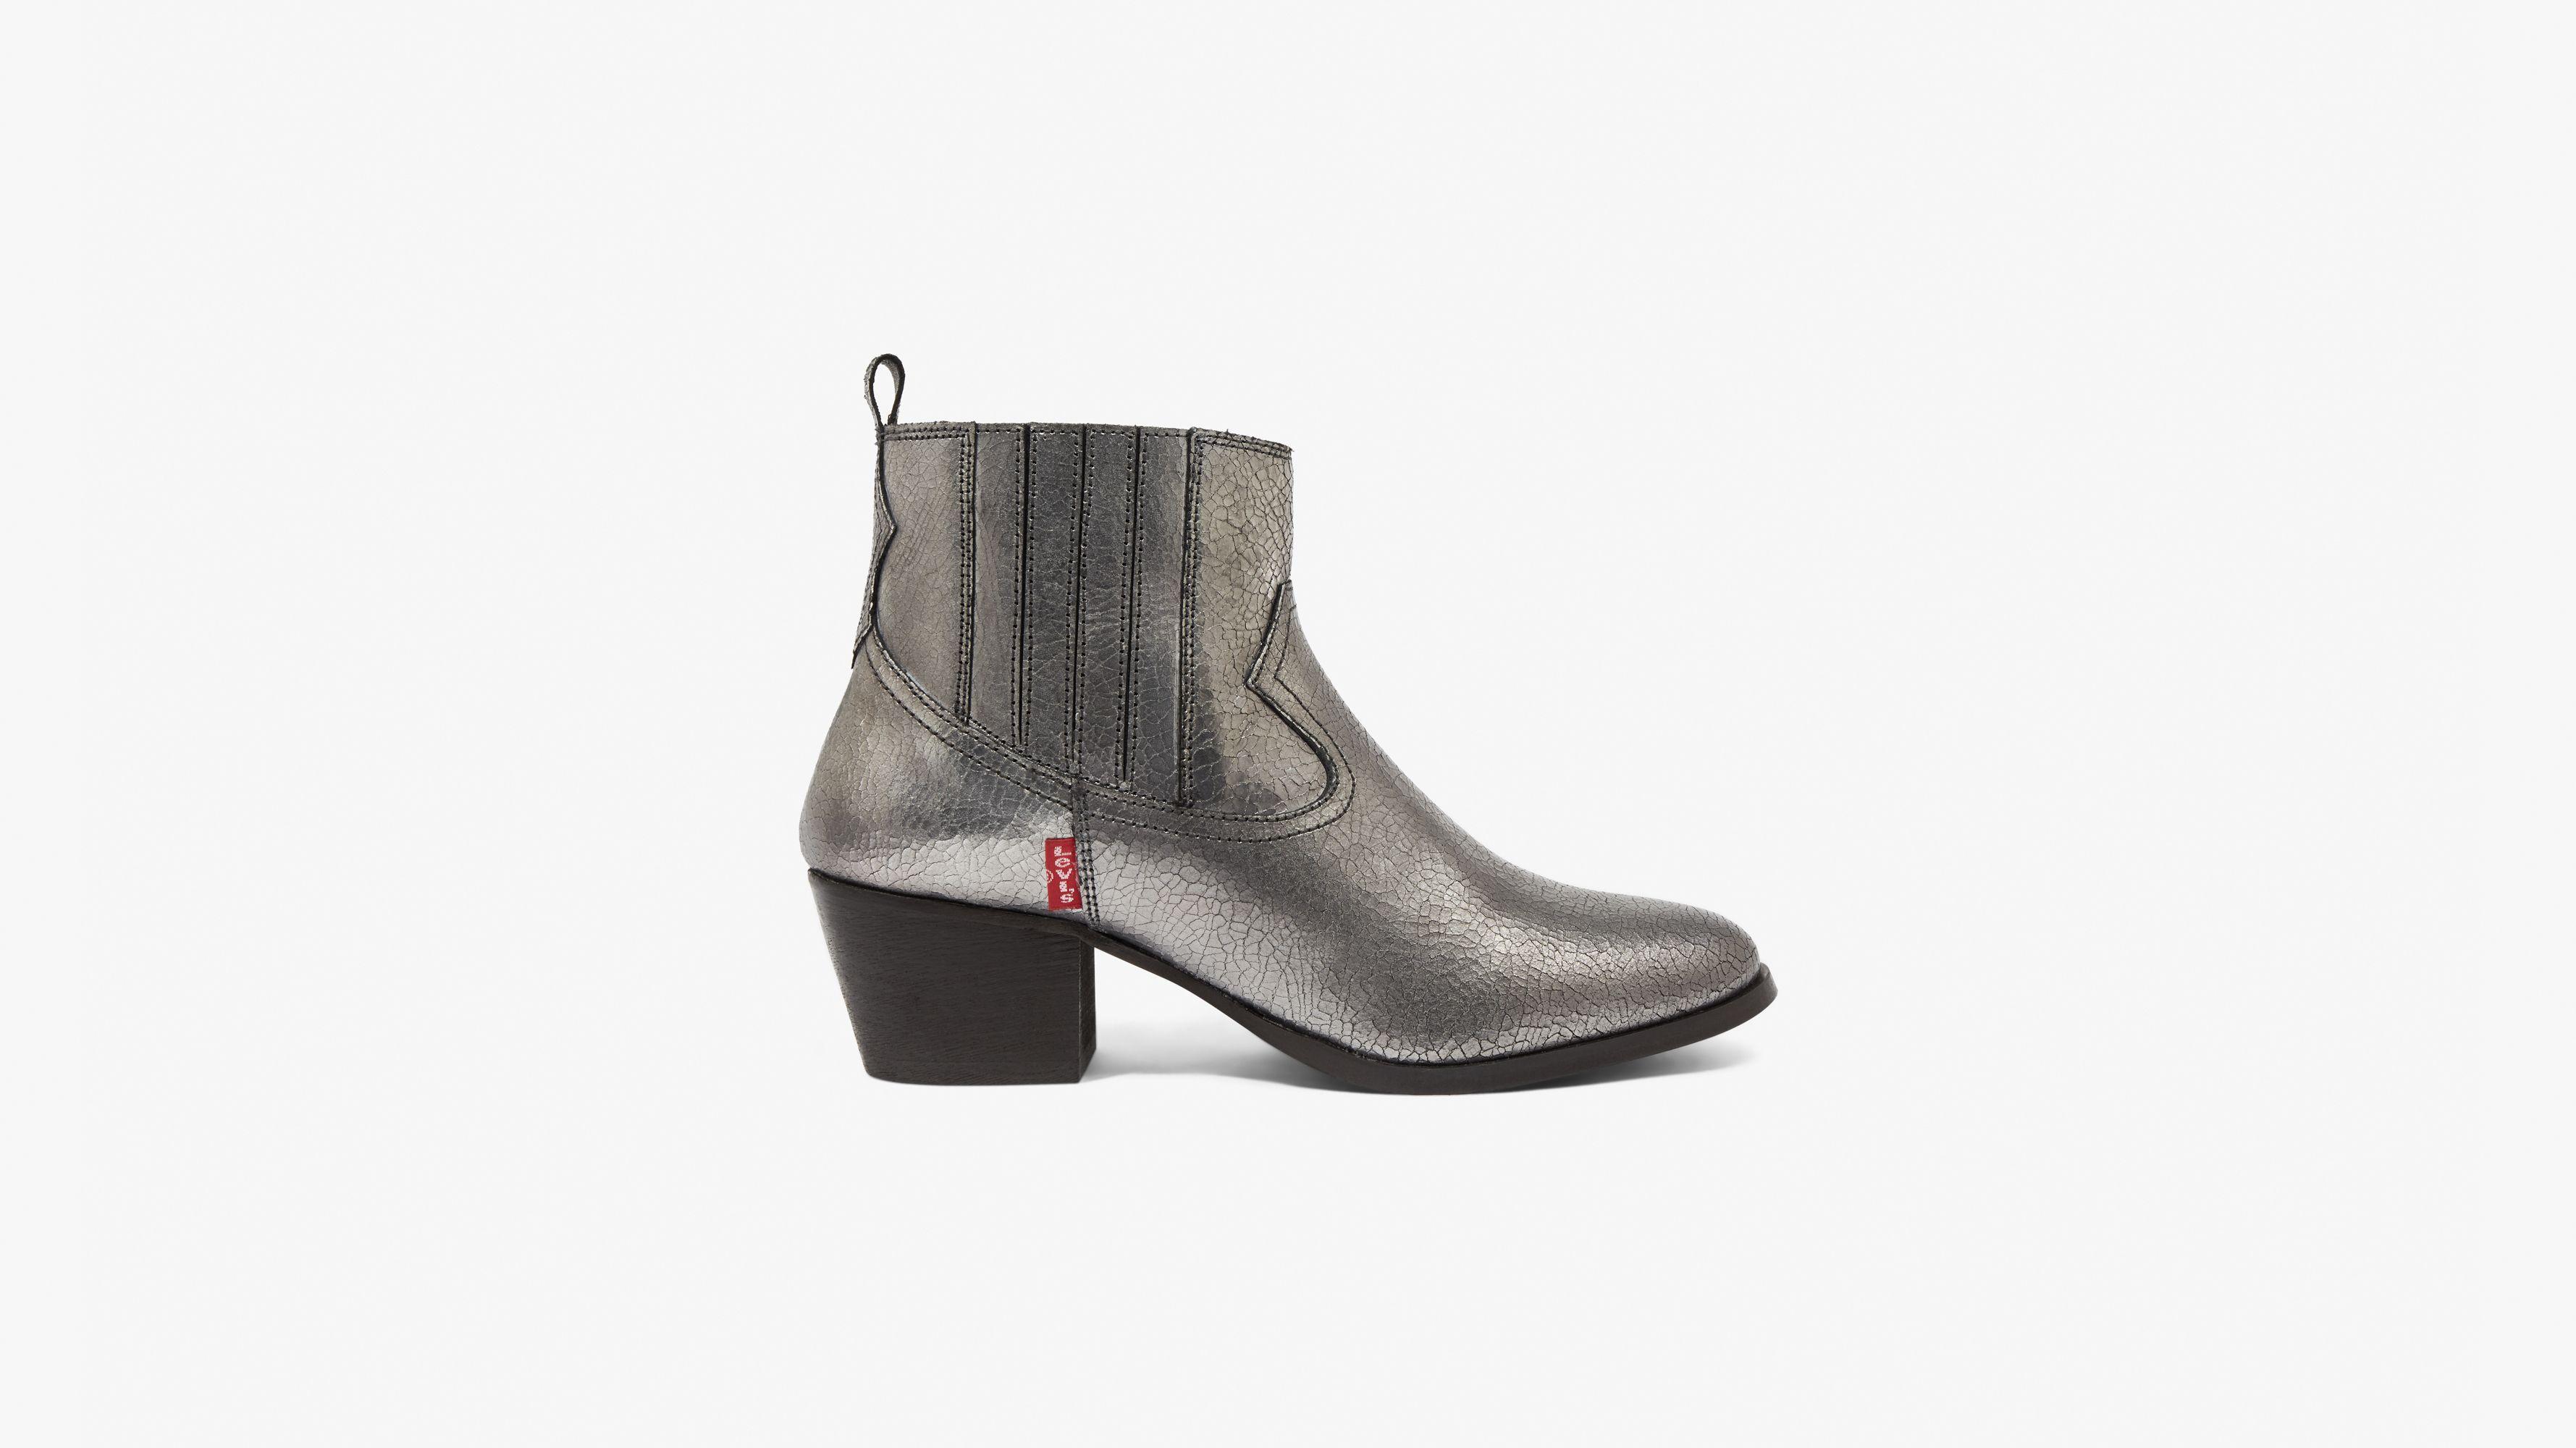 Chaussures Fr FemmeLevi's® Chaussures FemmeLevi's® Fr FemmeLevi's® Chaussures Fr Chaussures Fr FemmeLevi's® Chaussures Fr Chaussures FemmeLevi's® nPOX80wk